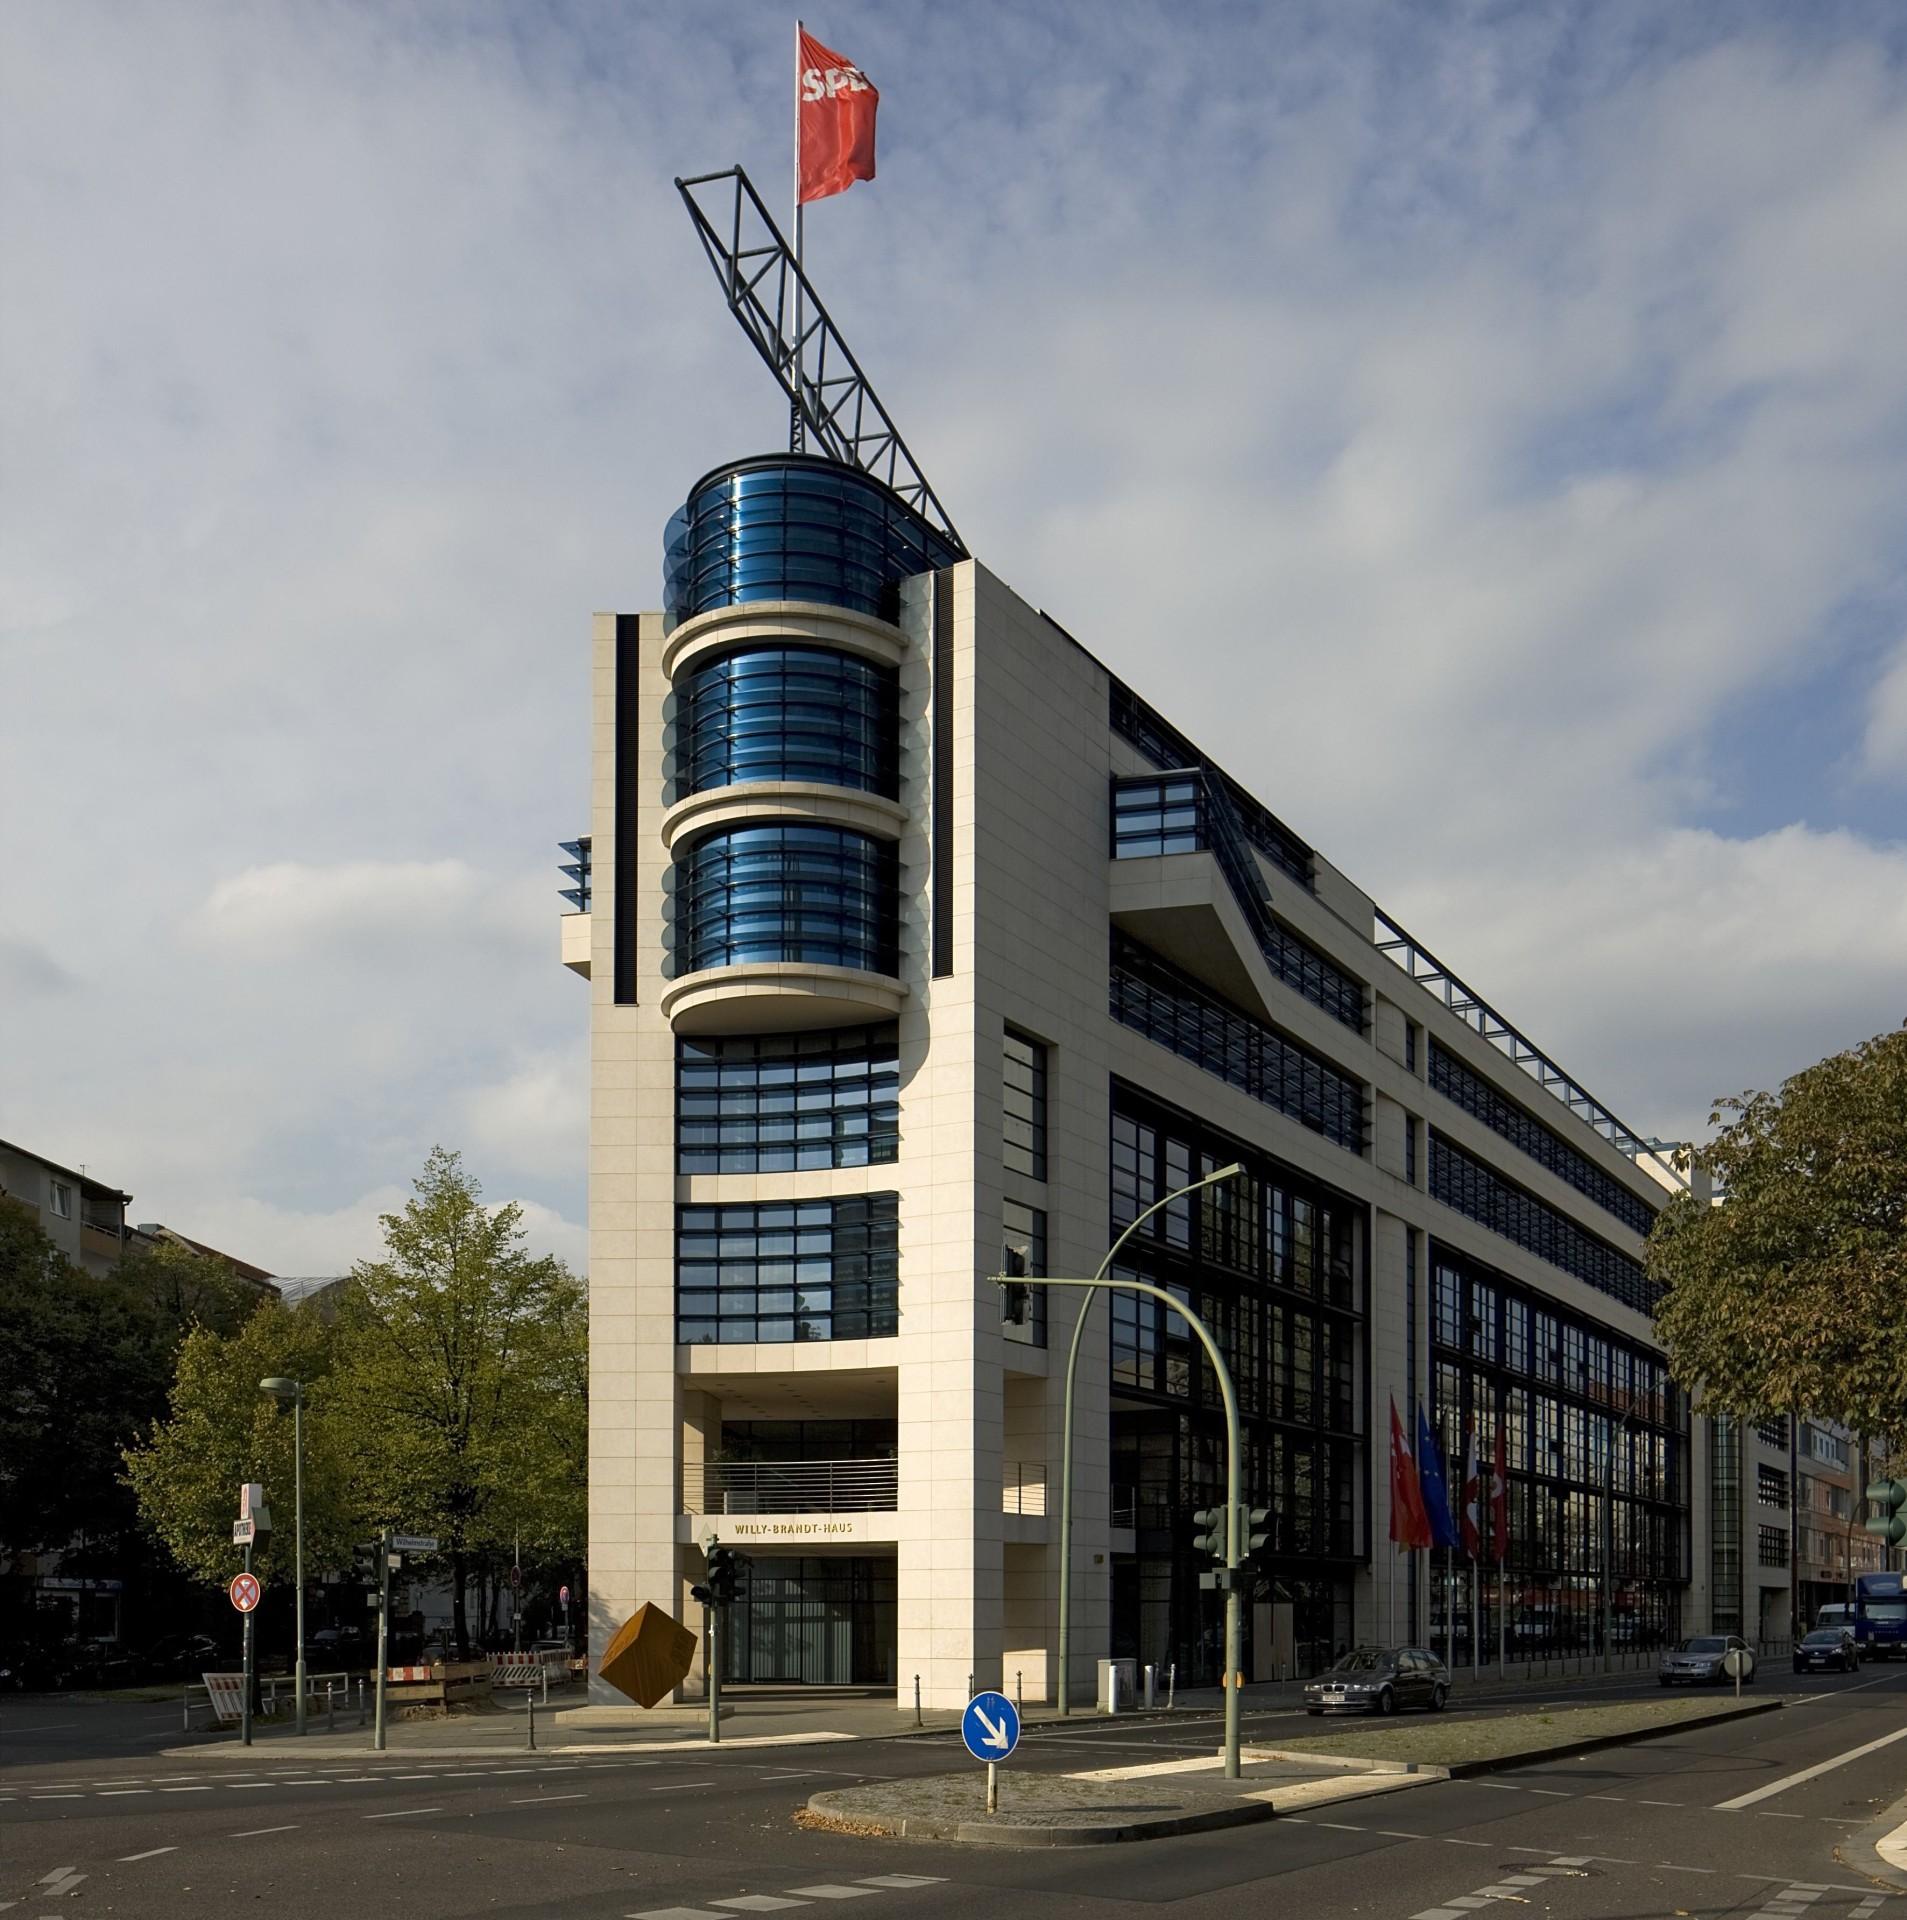 10963 Willy Brandt Haus Berlin Foto bearbeitet